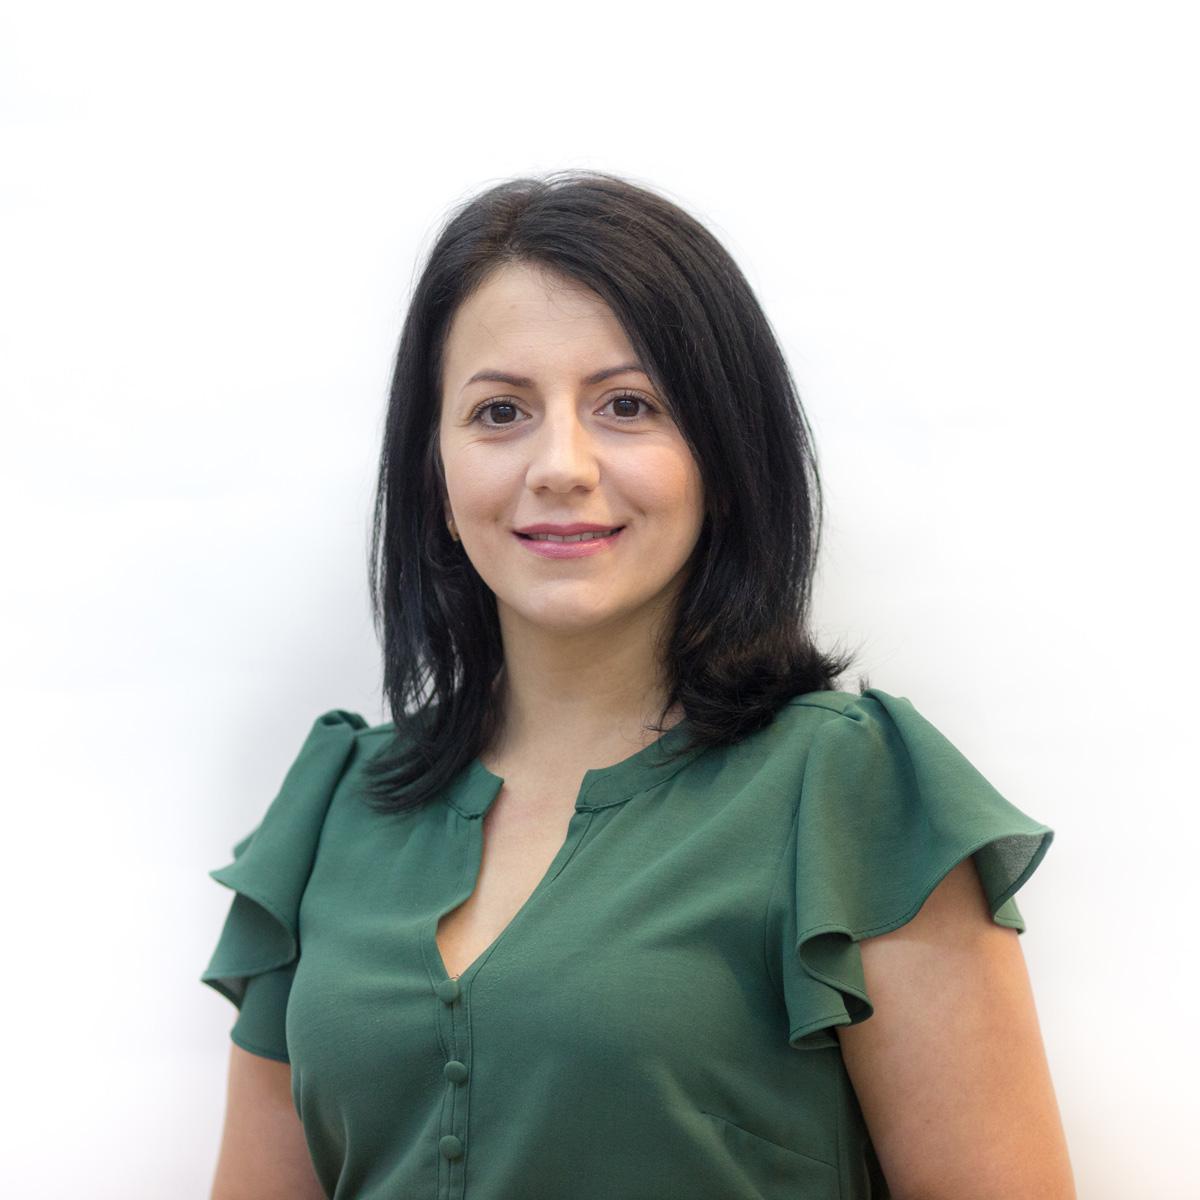 l_Adriana-Balsanu-Help-Autism-1597090167